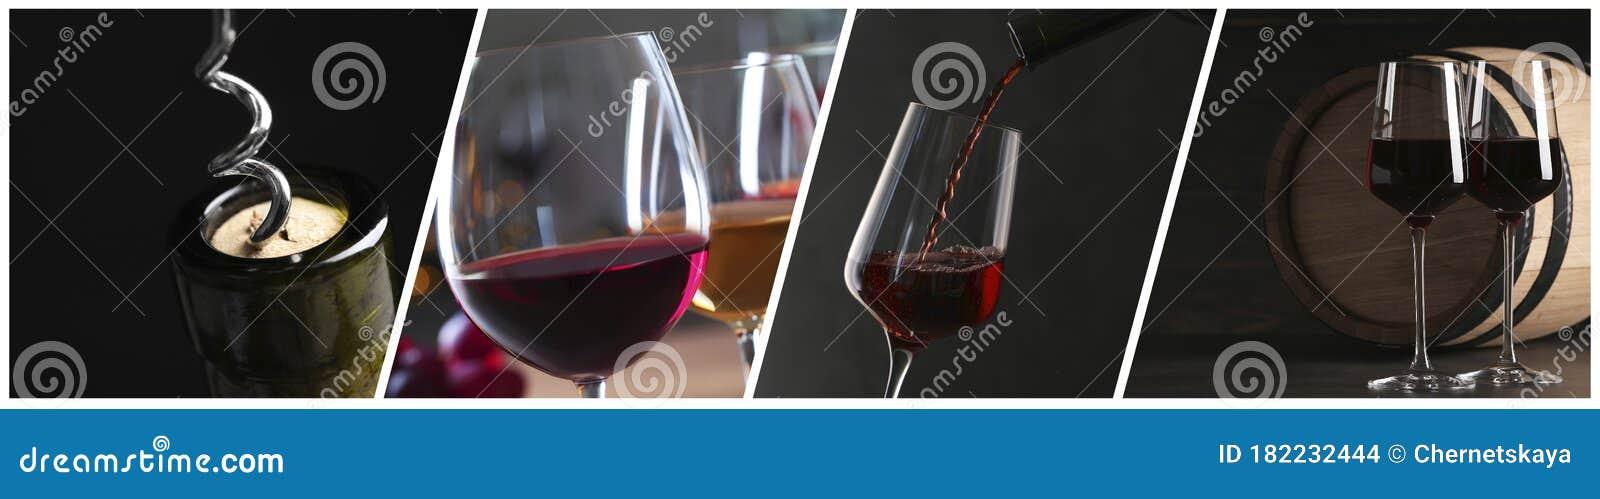 Glasses And Bottles Of Red Wine Banner Design Stock Photo Image Of Barrel Merlot 182232444